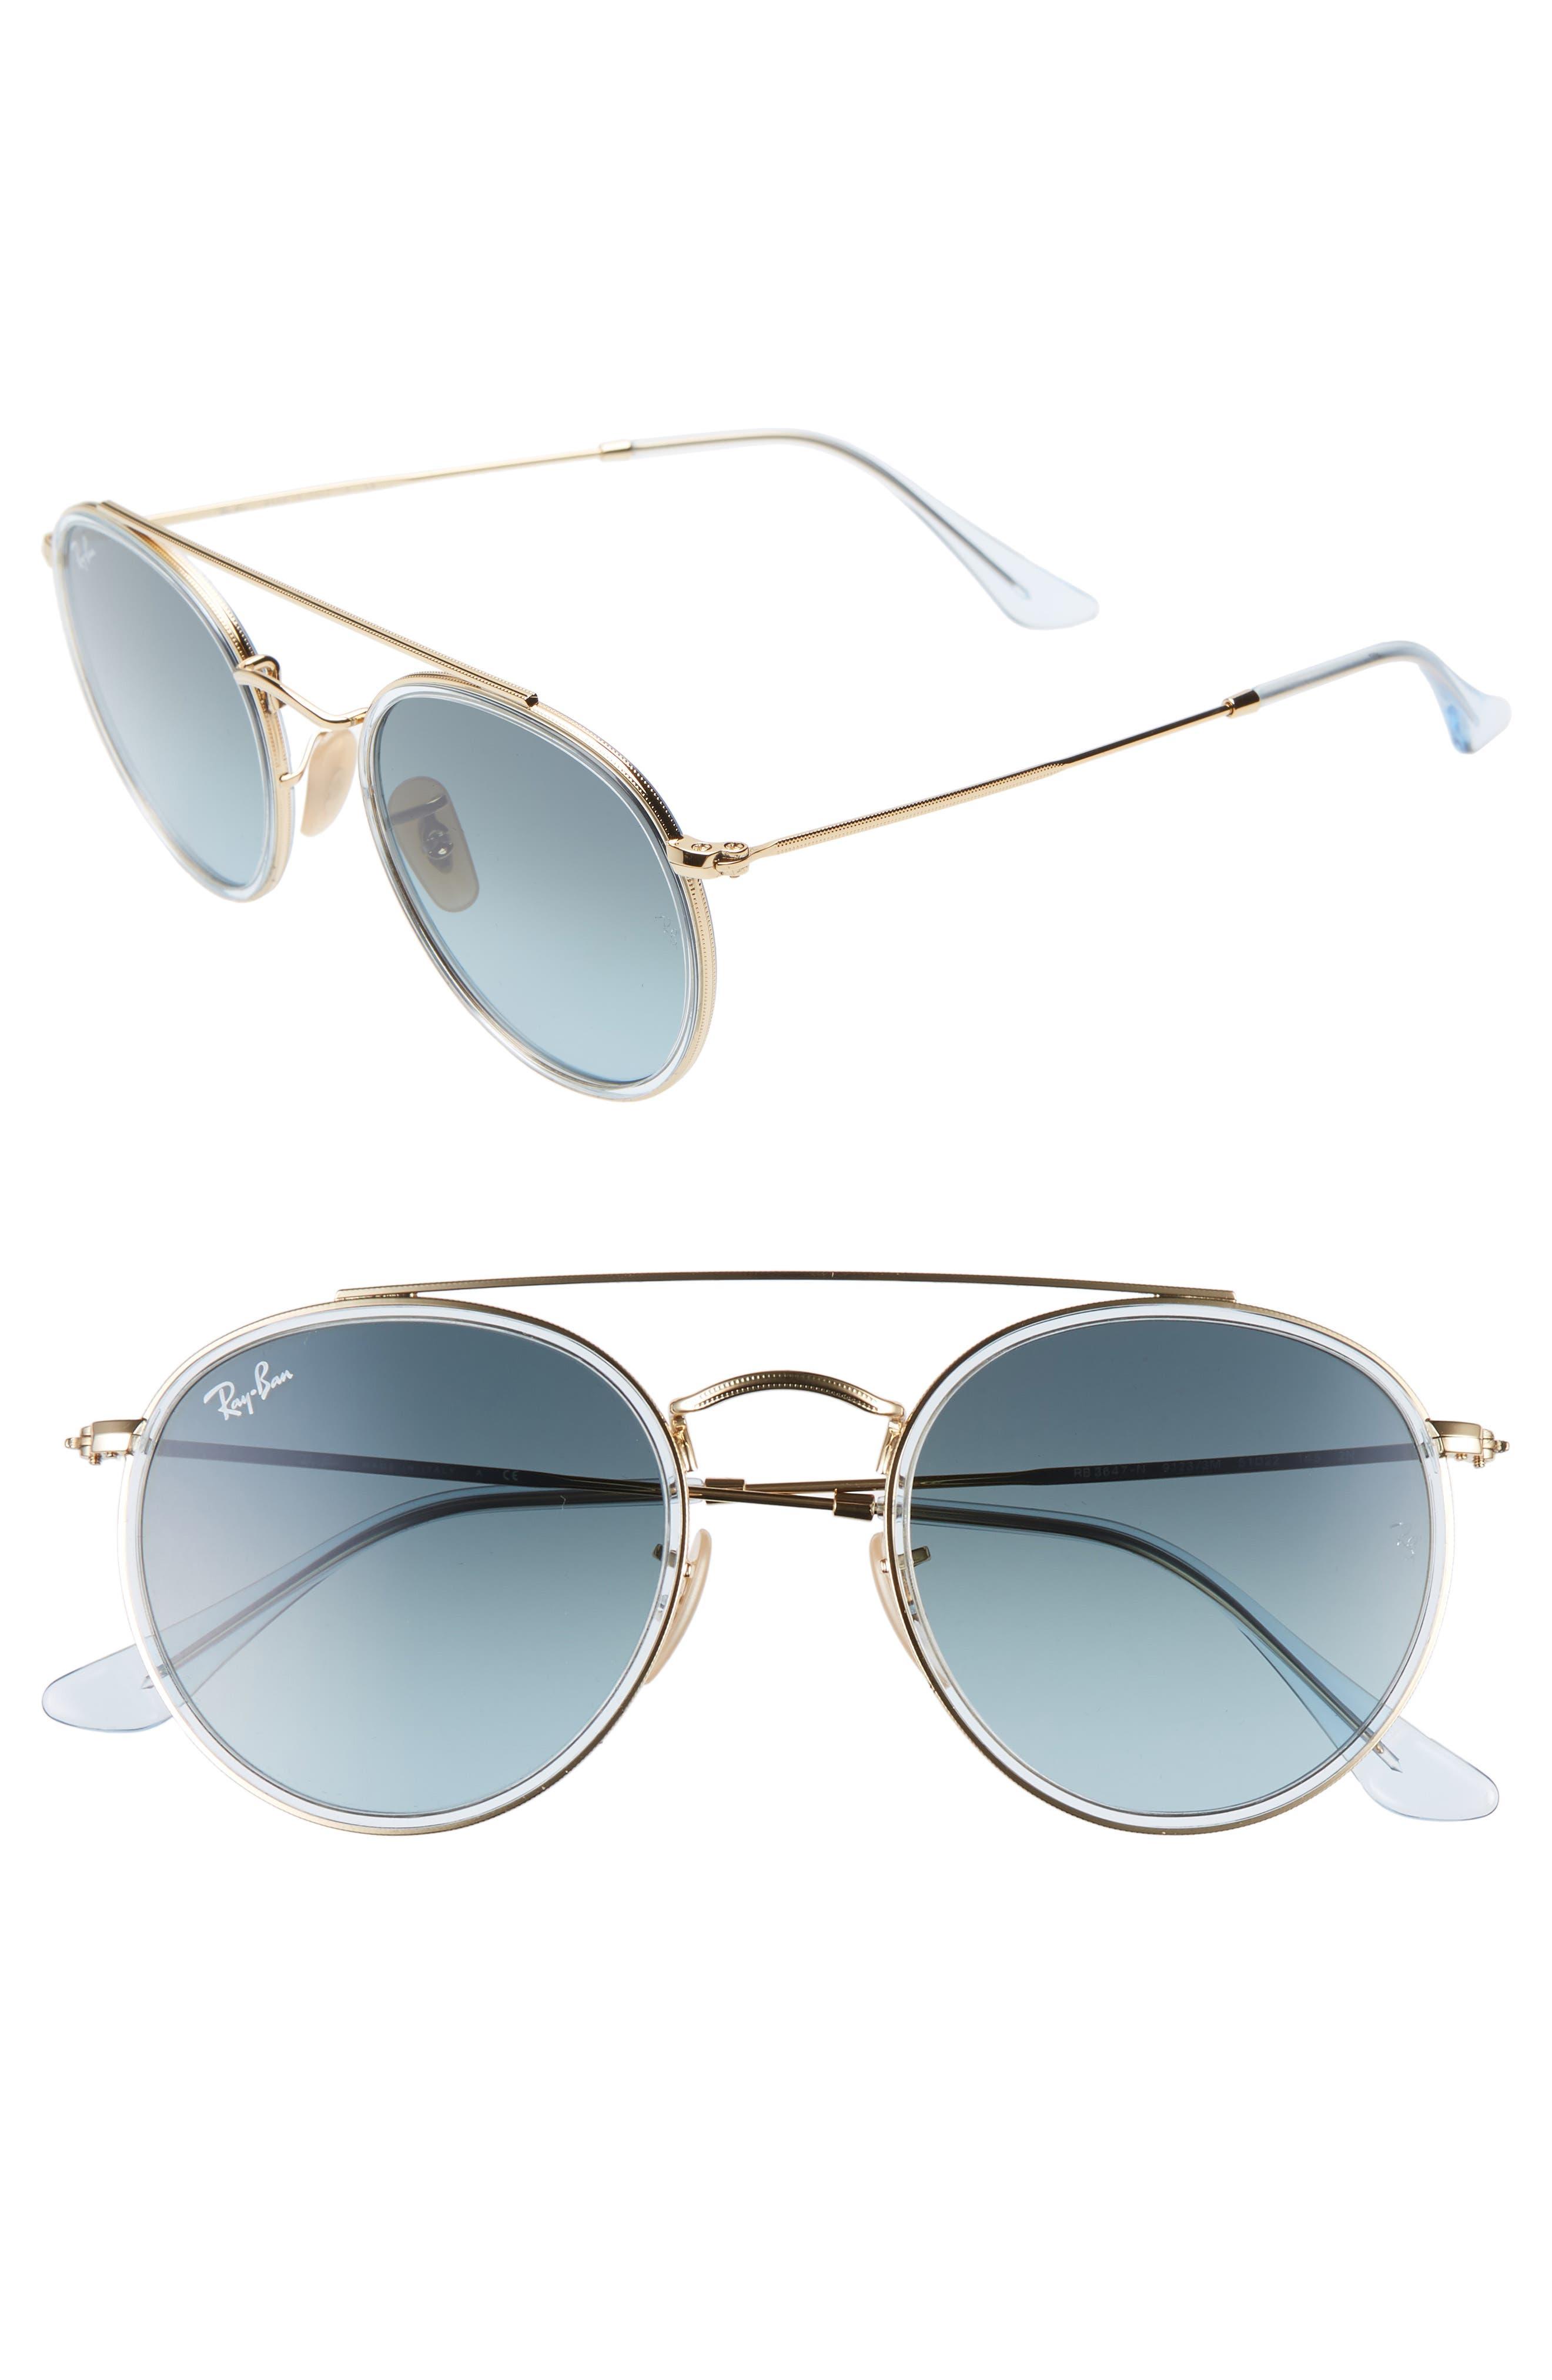 Ray-Ban 51Mm Aviator Gradient Lens Sunglasses - Gold/ Blue Gradient